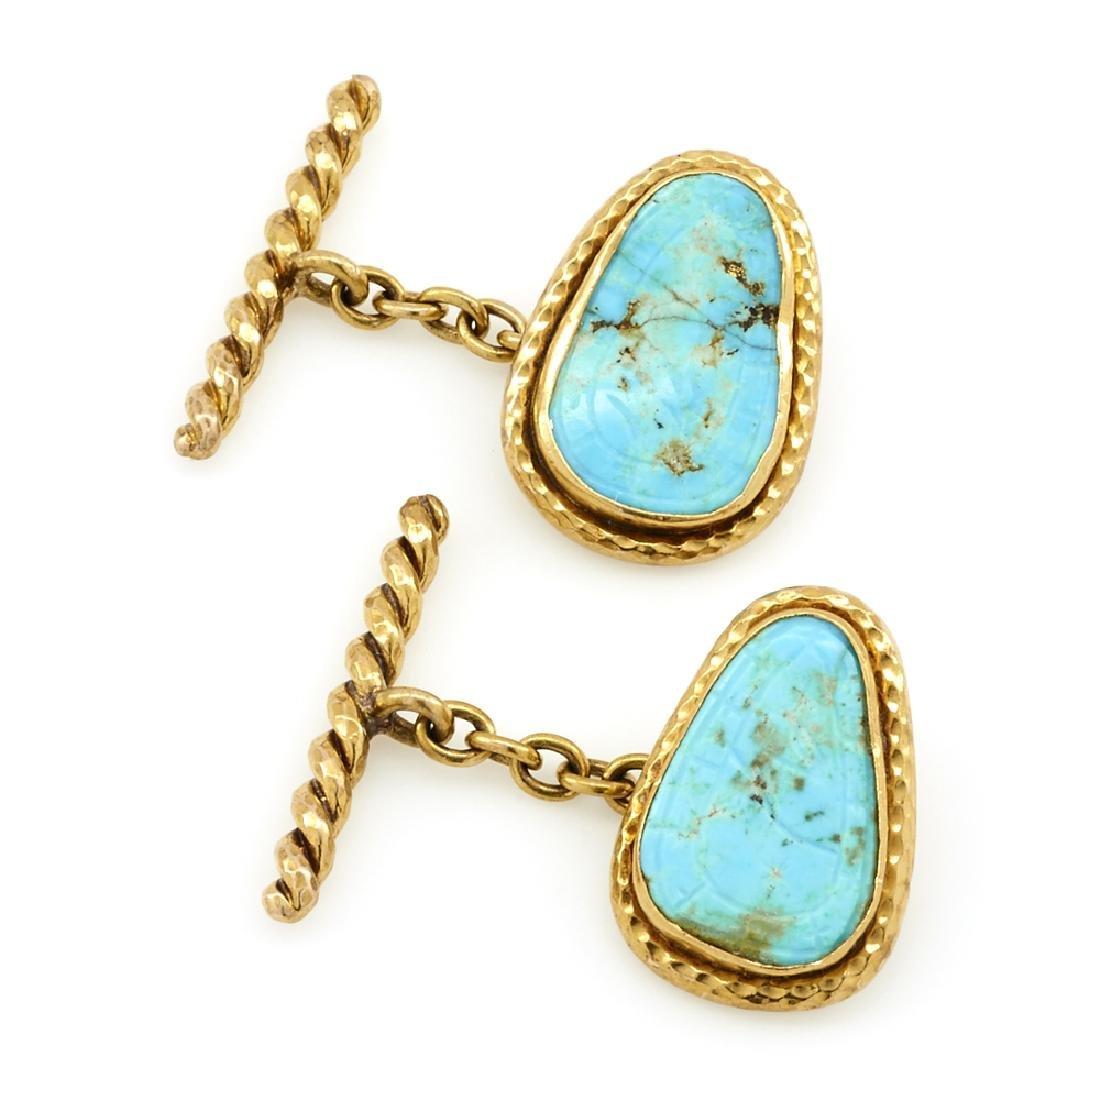 18k Yellow gold turquoise cufflinks